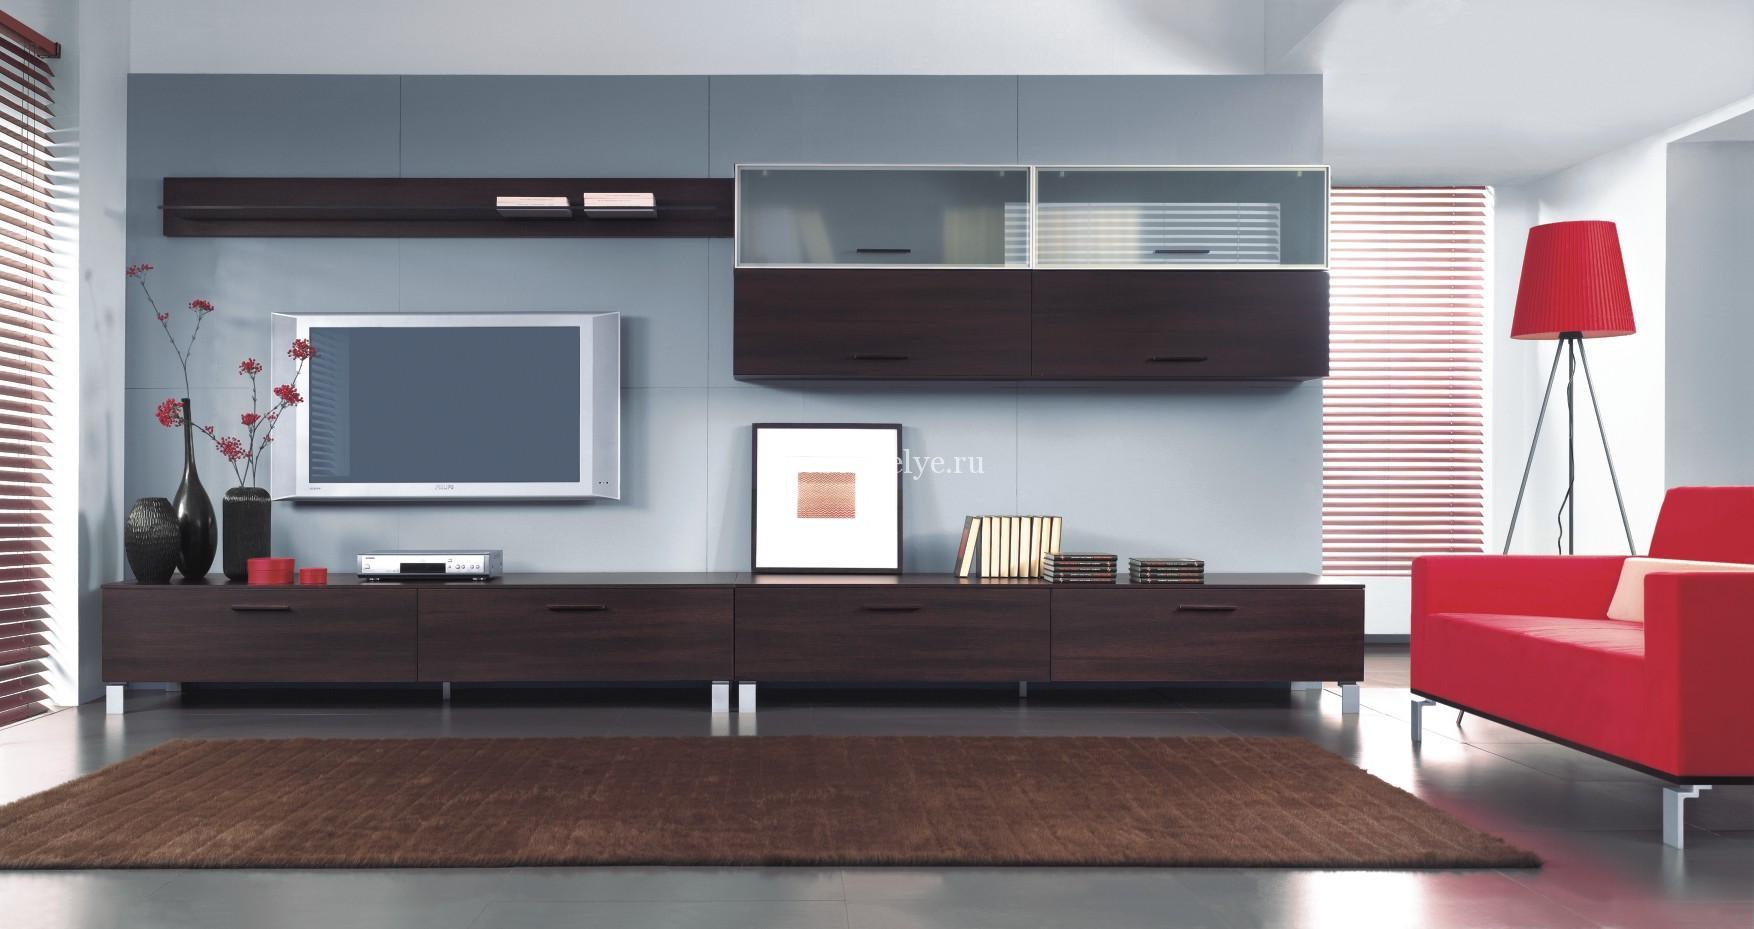 Decoraci n de salones modernos estilo minimalista hoy for Muebles de salon modernos